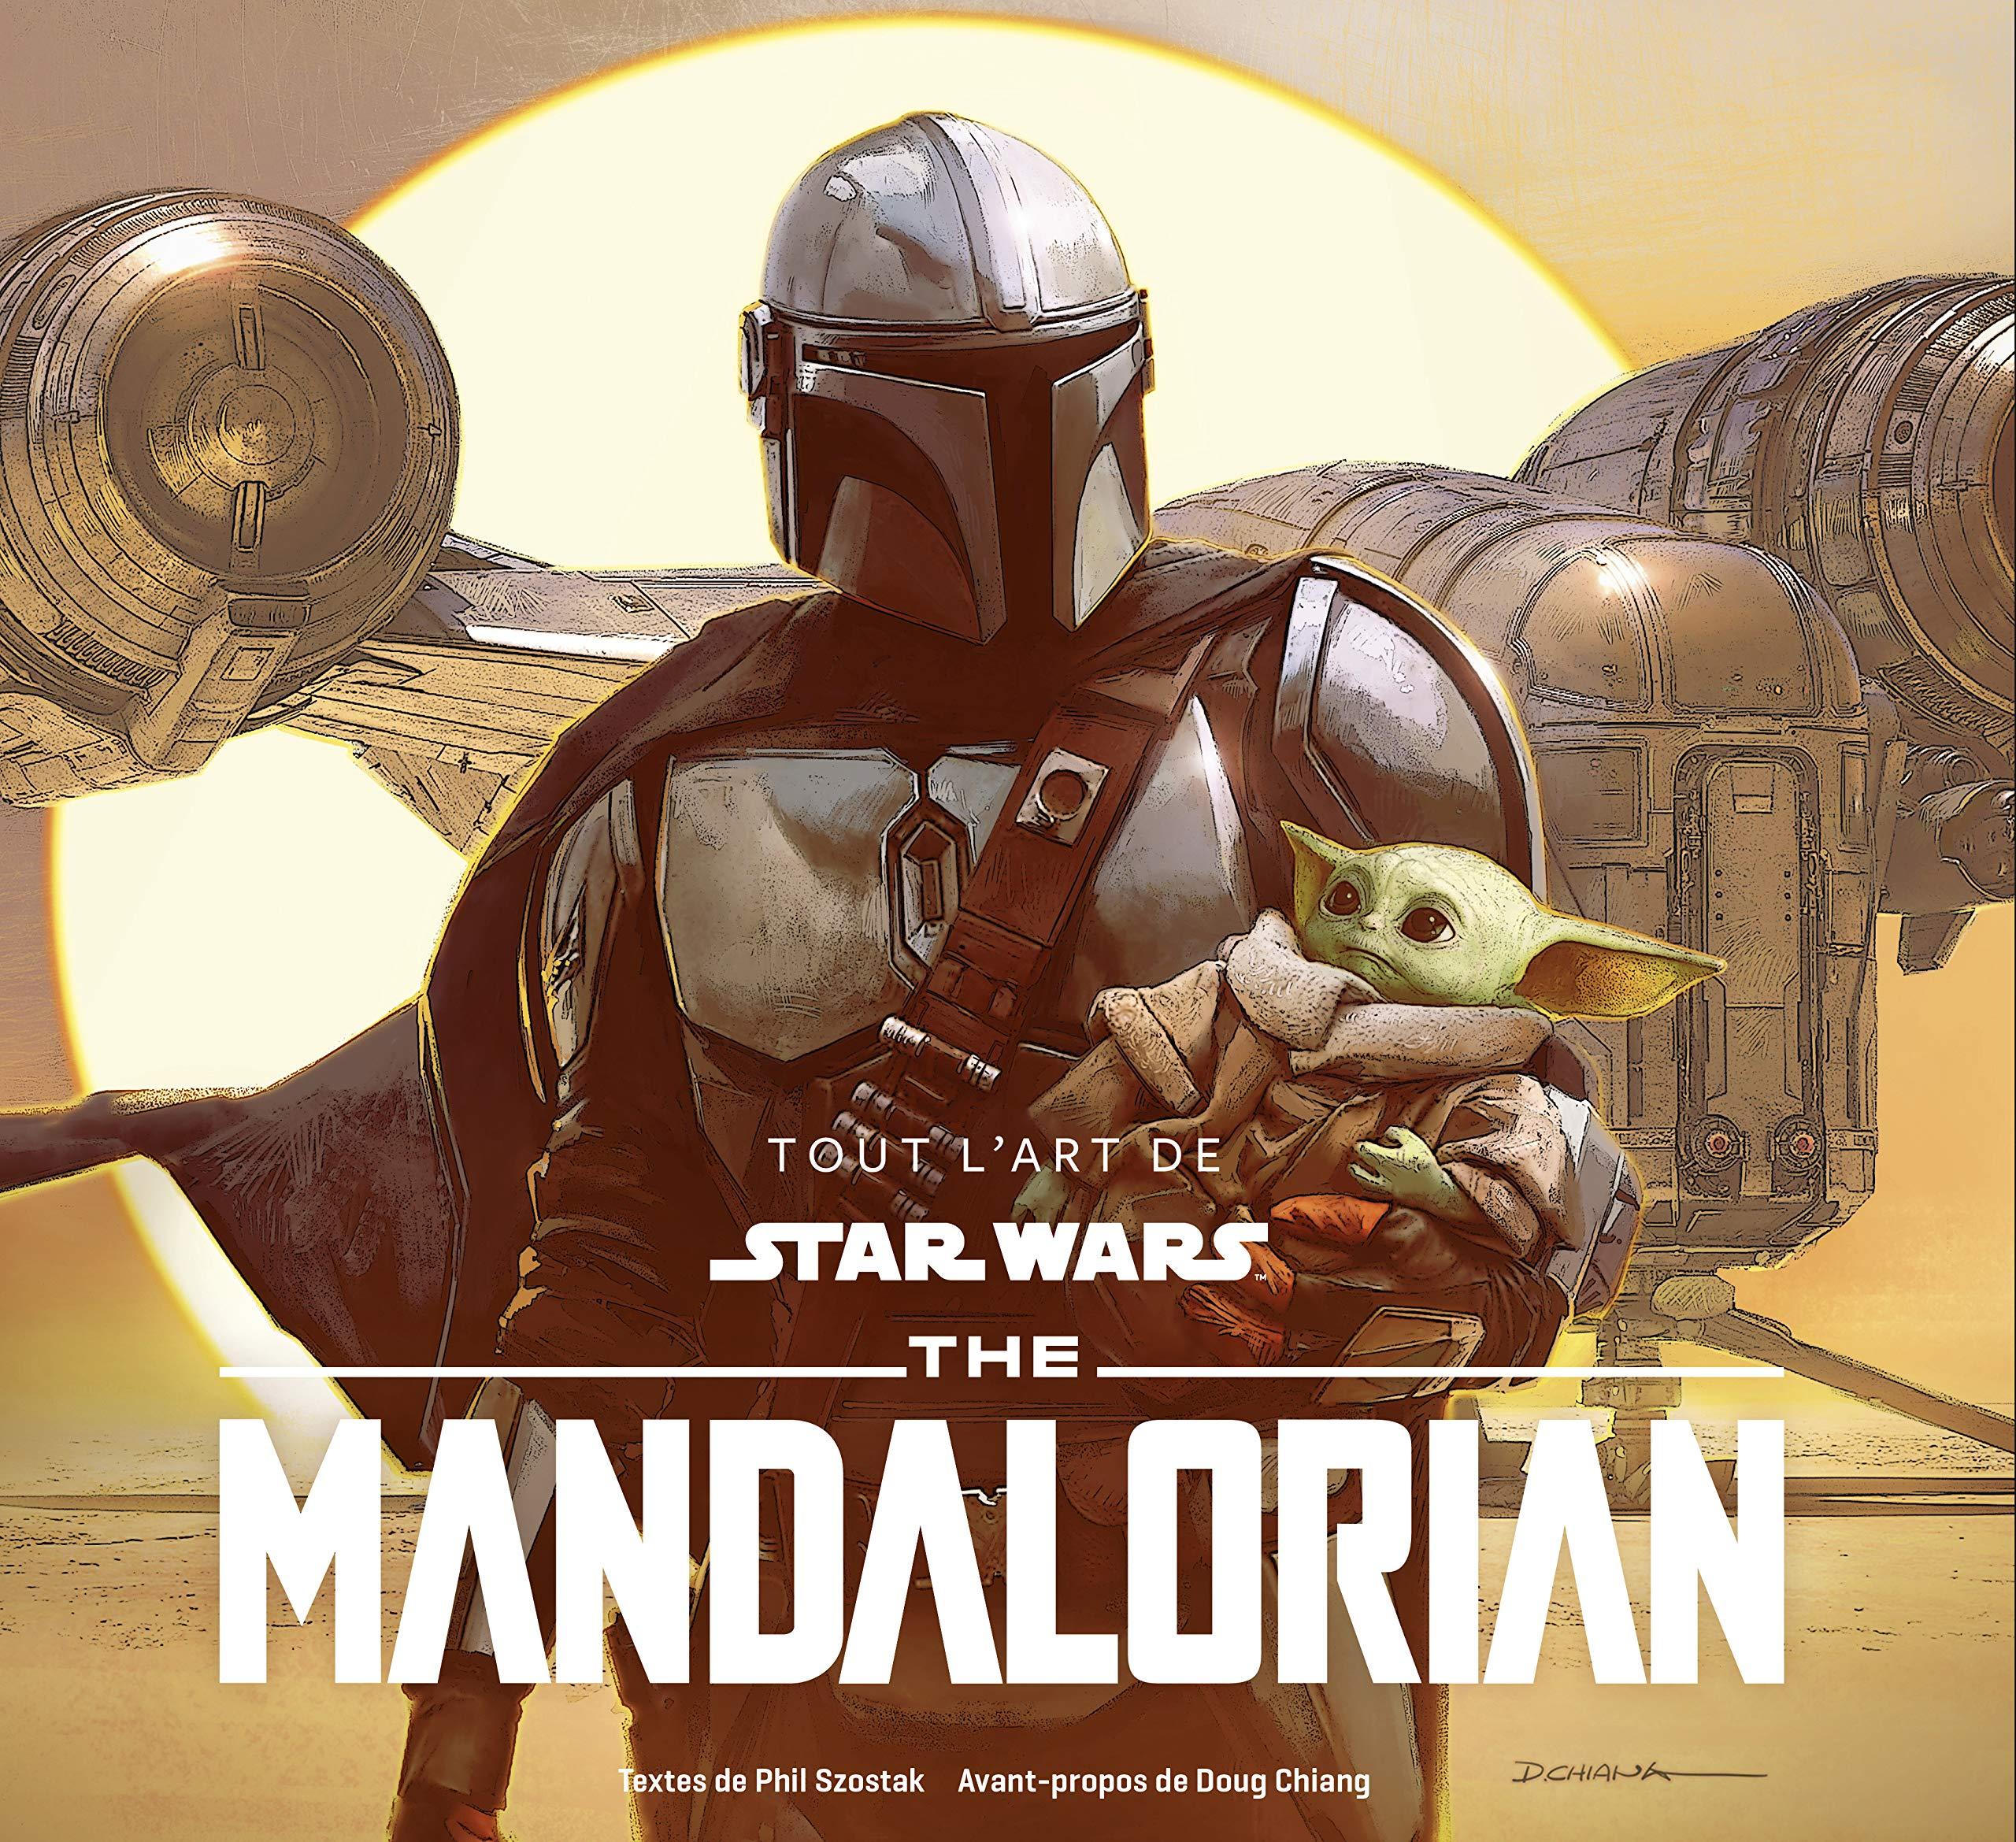 Star Wars : Tout l'art de Star Wars : The Mandalorian